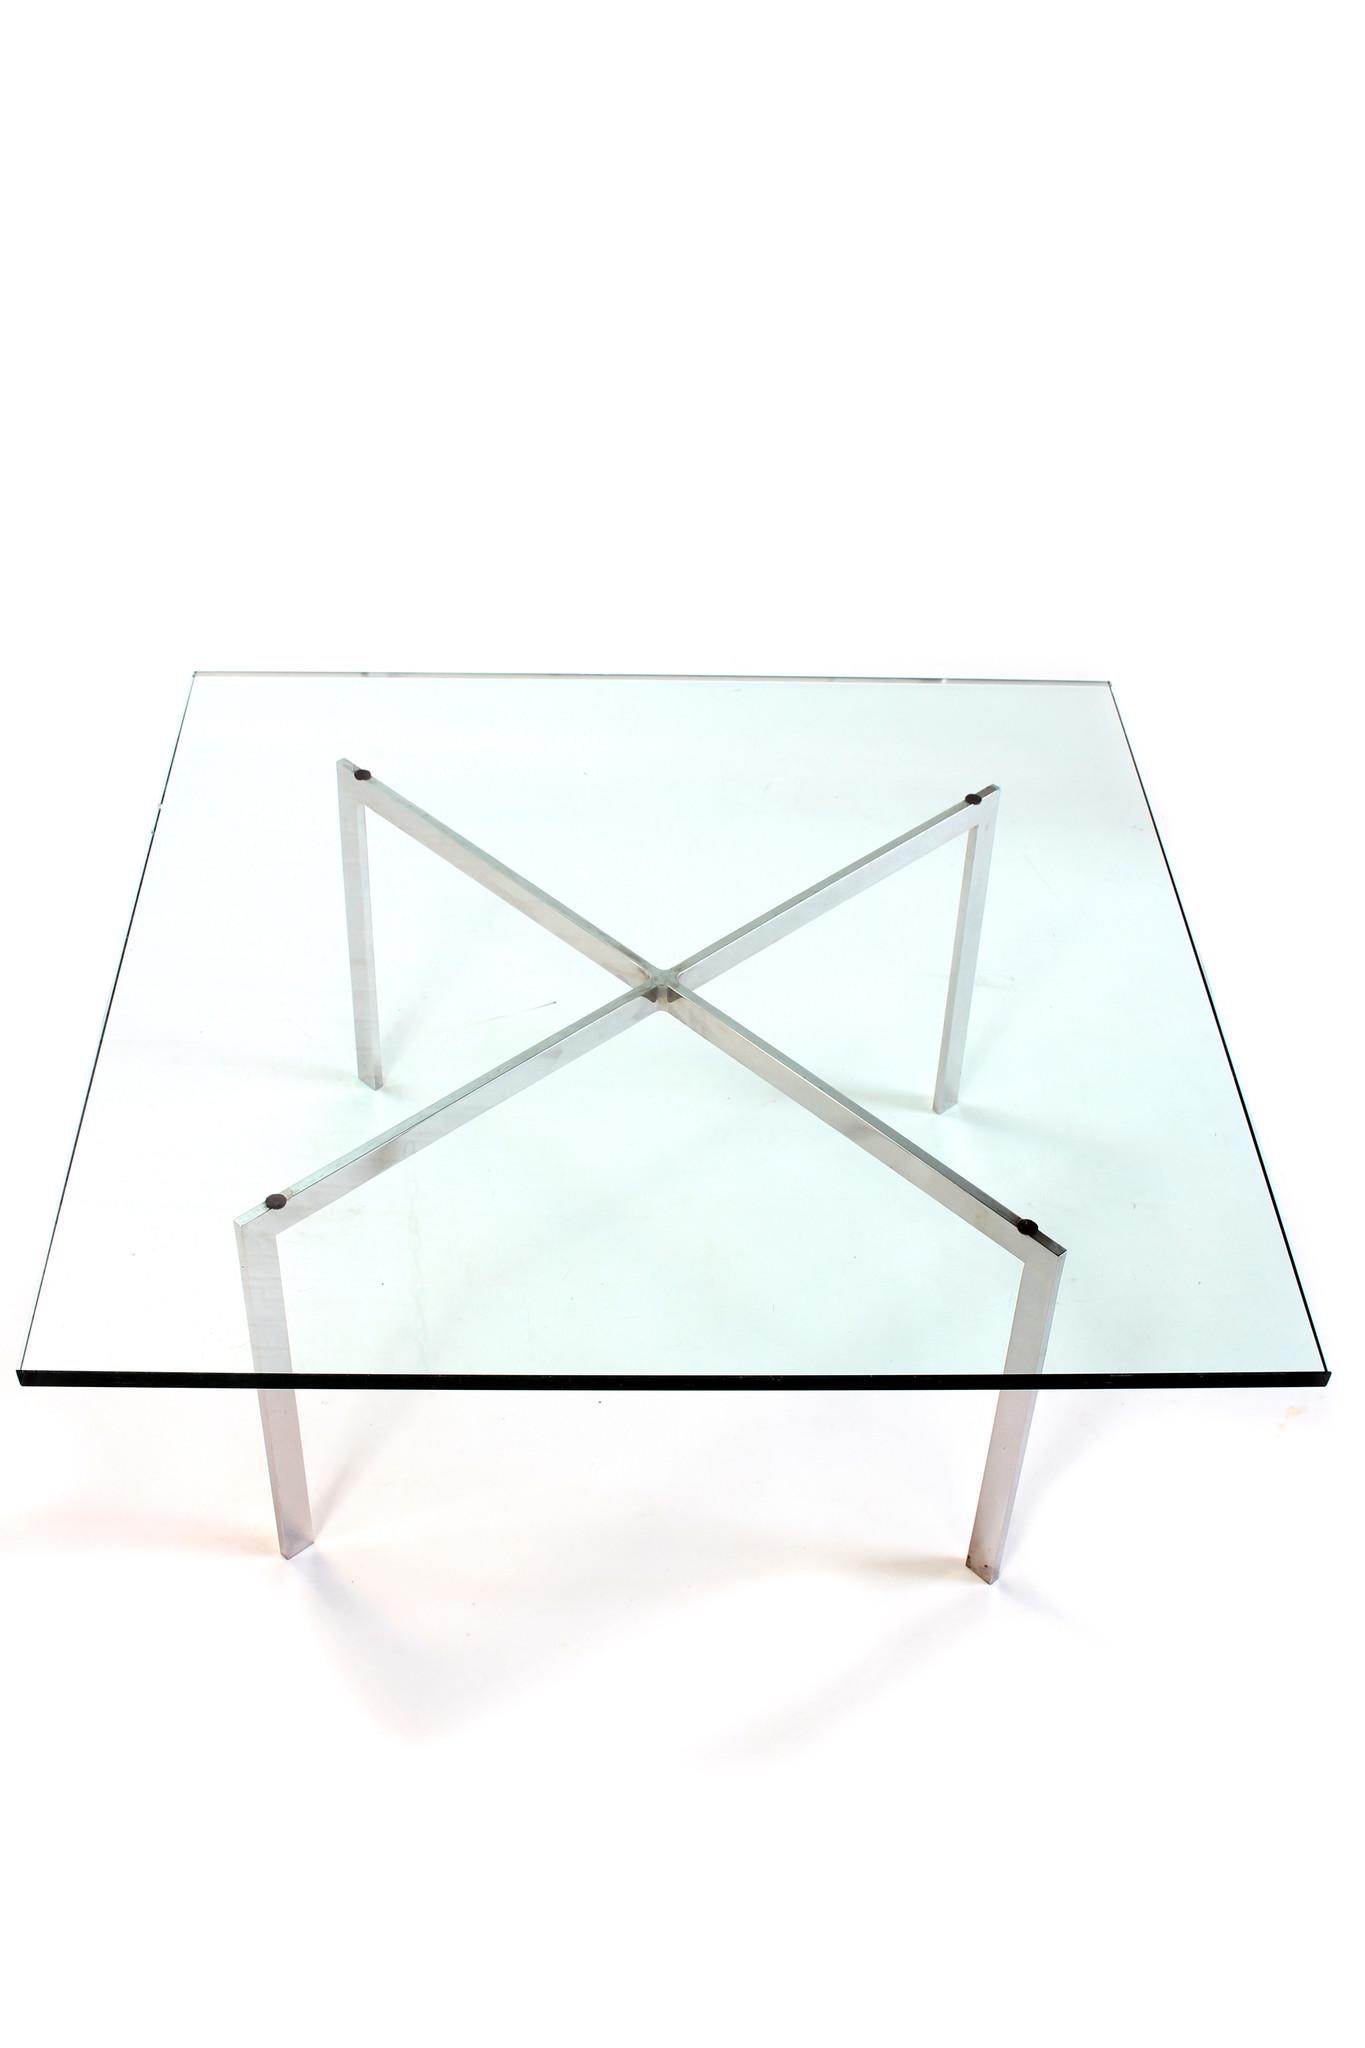 Coffee table Barcelona Ludwig Mies van der Rohe